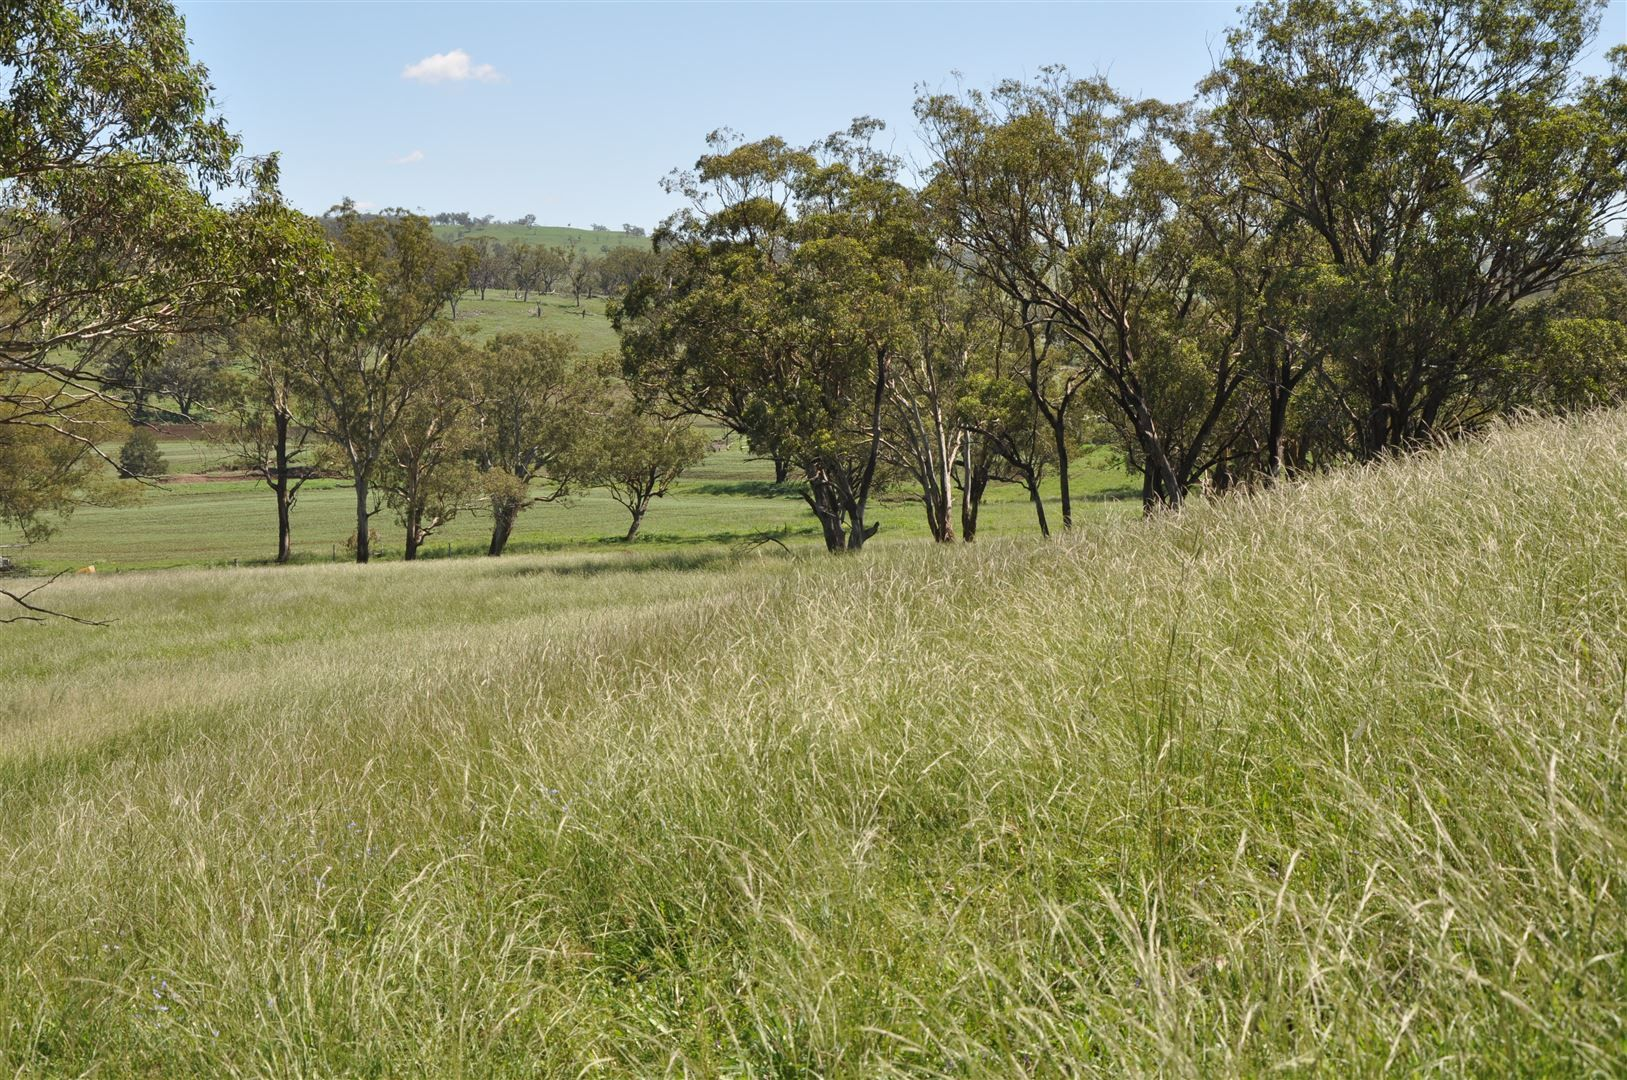 705 Coolah Rd, 'Culbara', Cassilis NSW 2329, Image 2